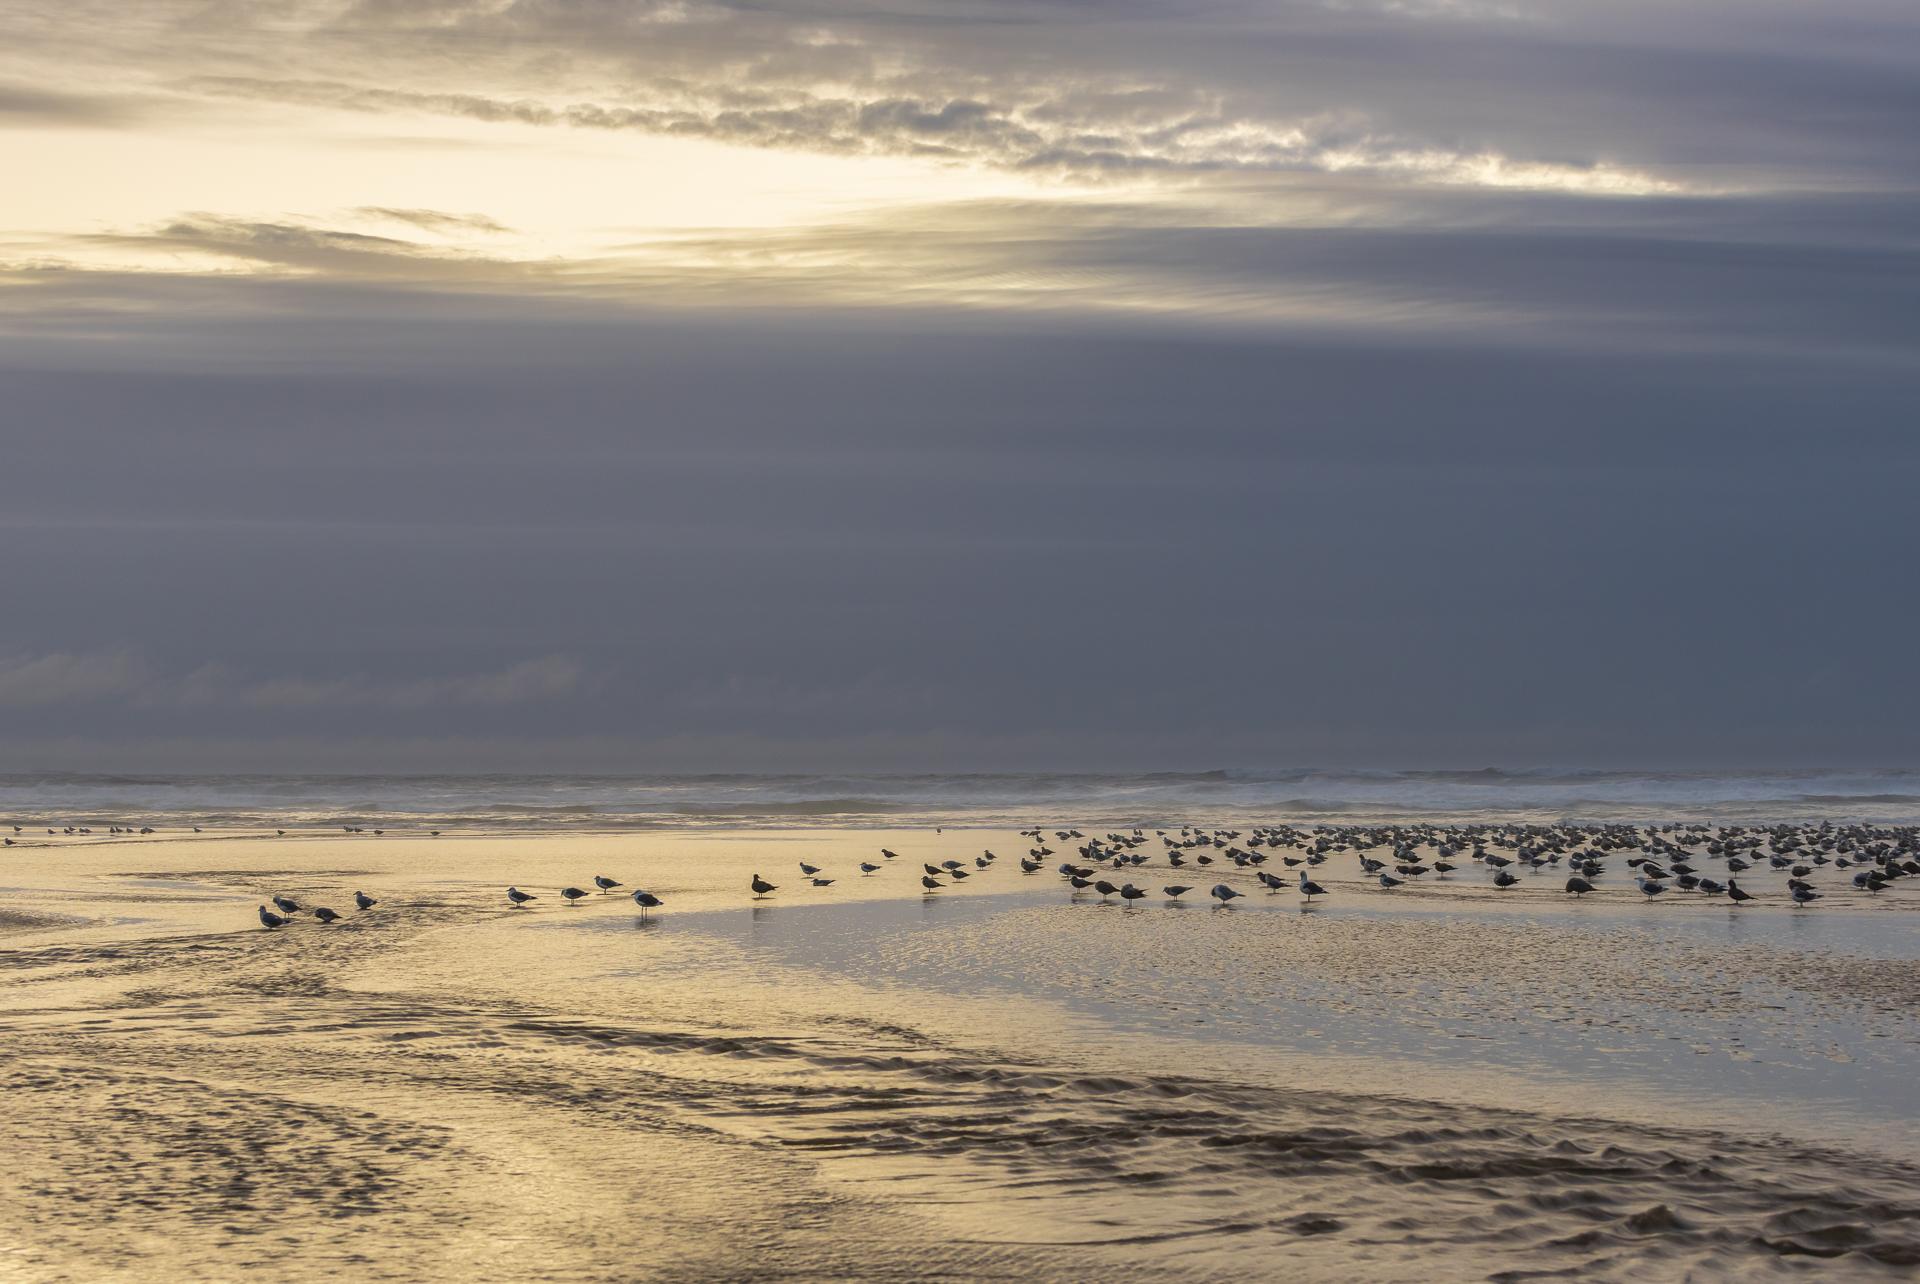 Seagulls, Ecola State Park